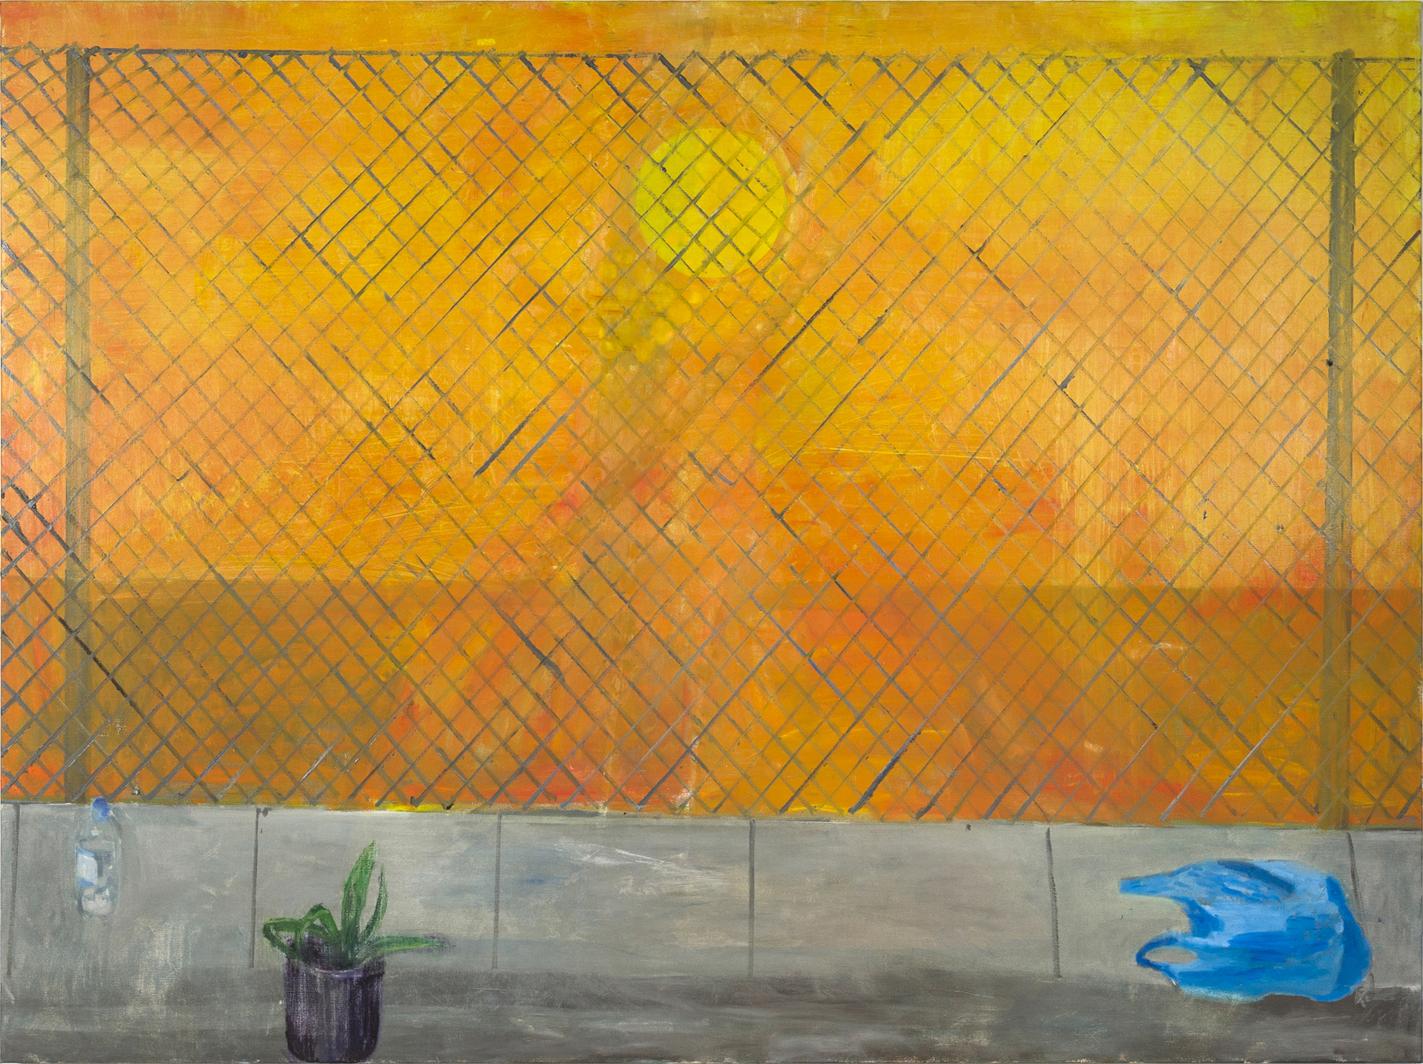 NICK COLLERSON  Symphony , 2018 oil on linen 137 x 183 cm